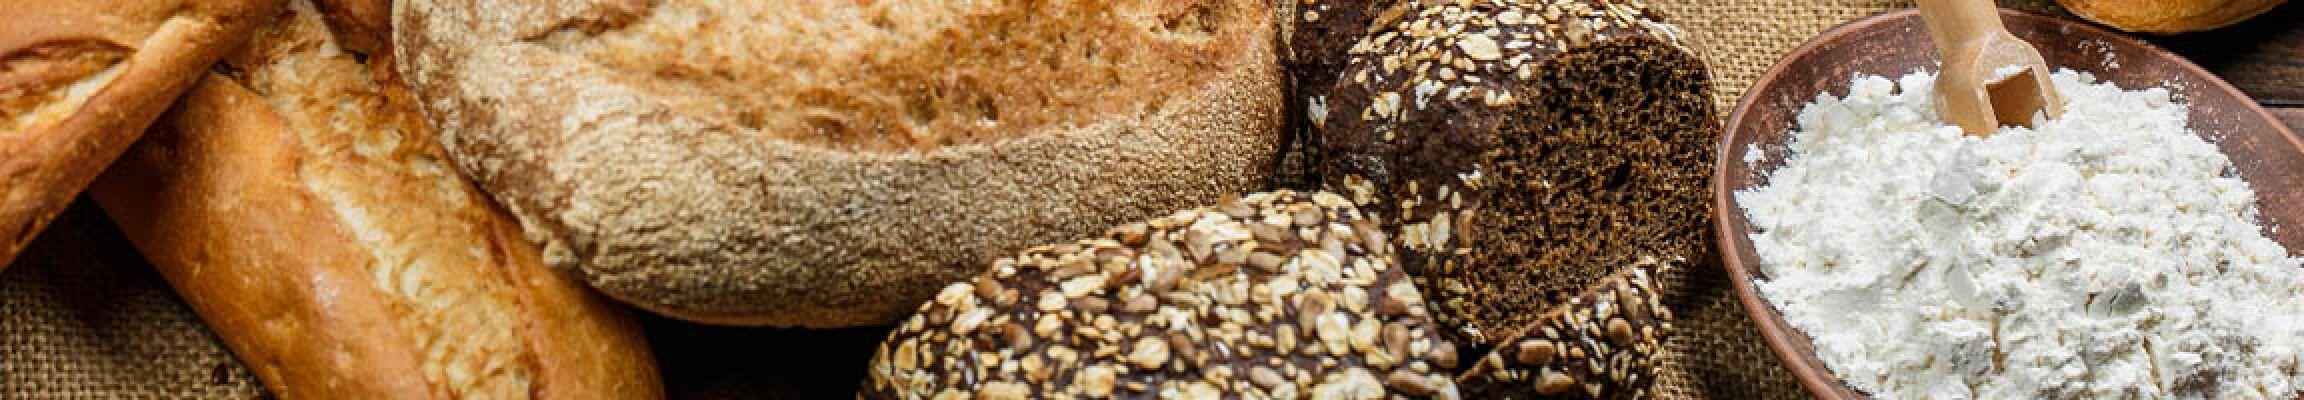 Macht Gluten fett?